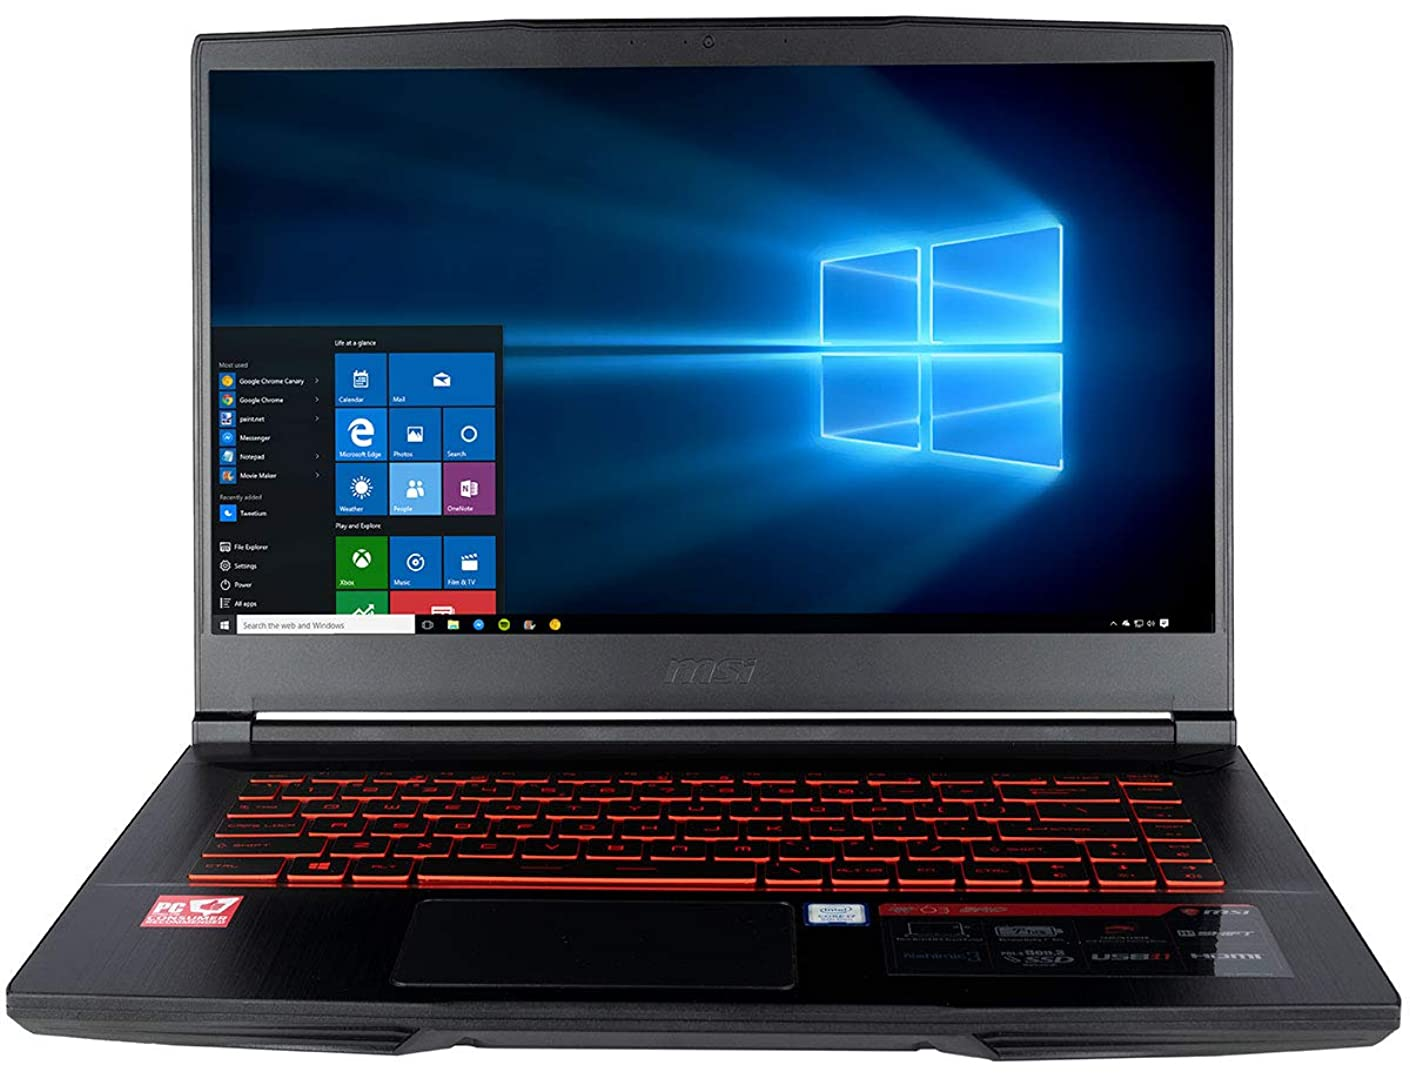 CUK MSI GF63 8RC Thin & Light Gaming Laptop (Intel i7-8750H, 32GB RAM, 512GB NVMe SSD + 1TB HDD, NVIDIA GeForce GTX 1050 4GB, 15.6